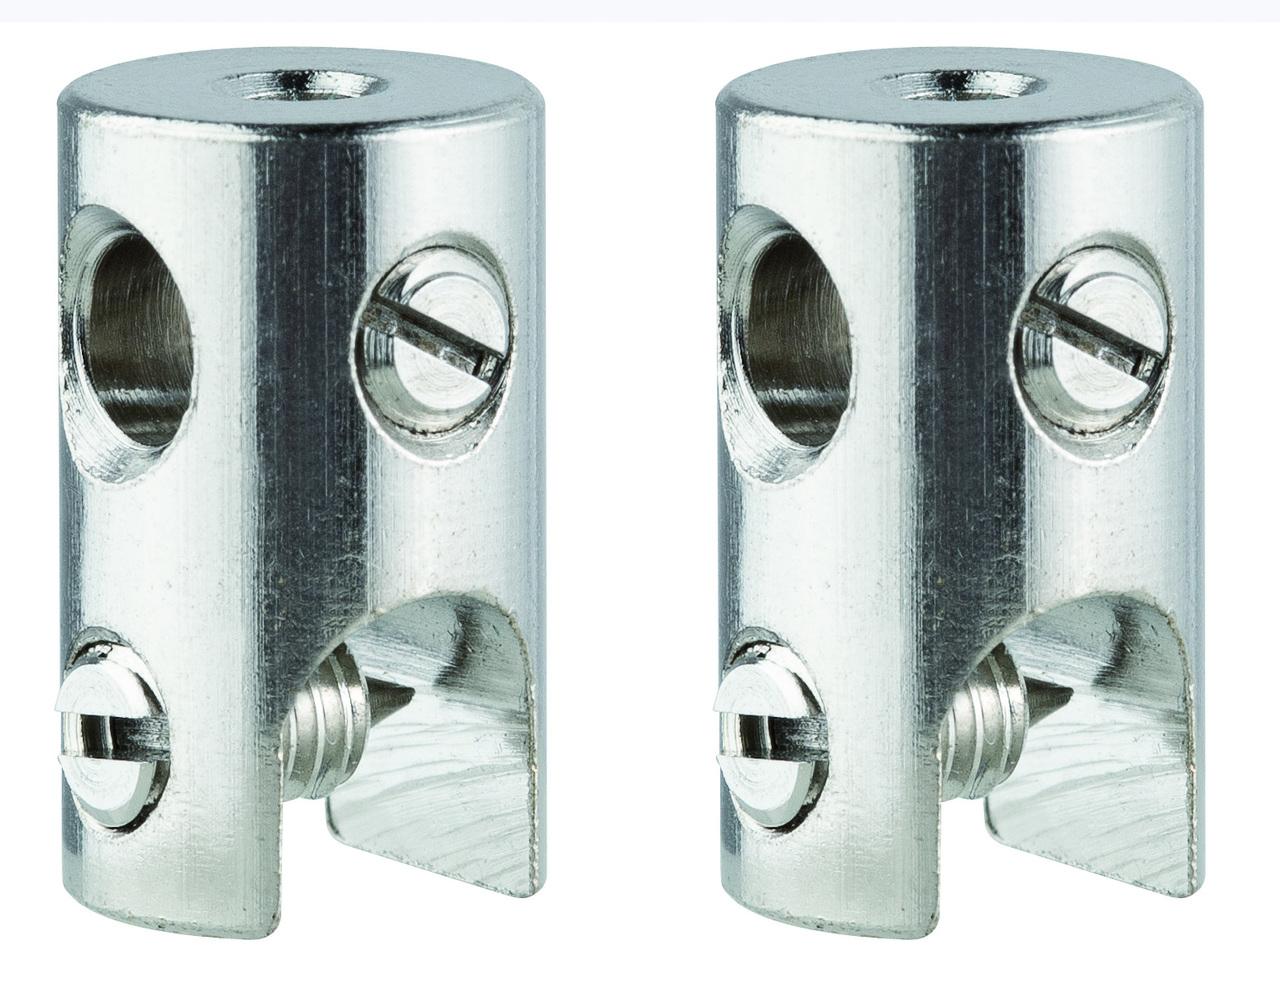 Paulmann Seilsystem WS L&E Seilklotz Seilsysteme 2er Pack Max150W/Stange Max300W C, Chrom, Metall, 978.019